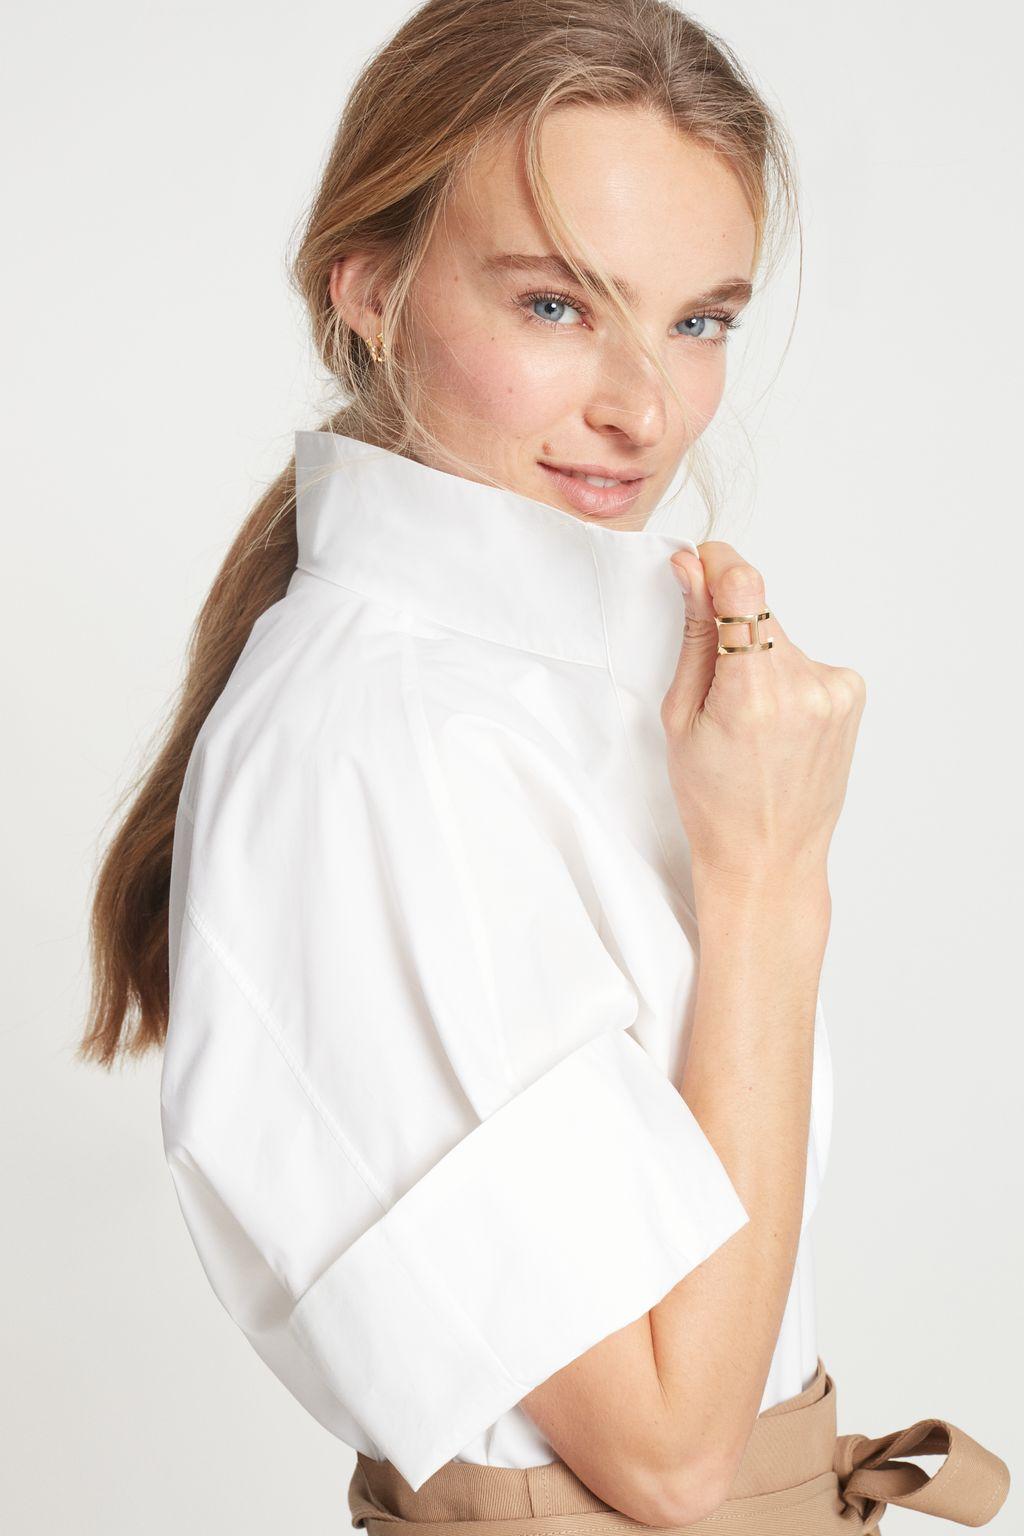 White shirt with raised collar